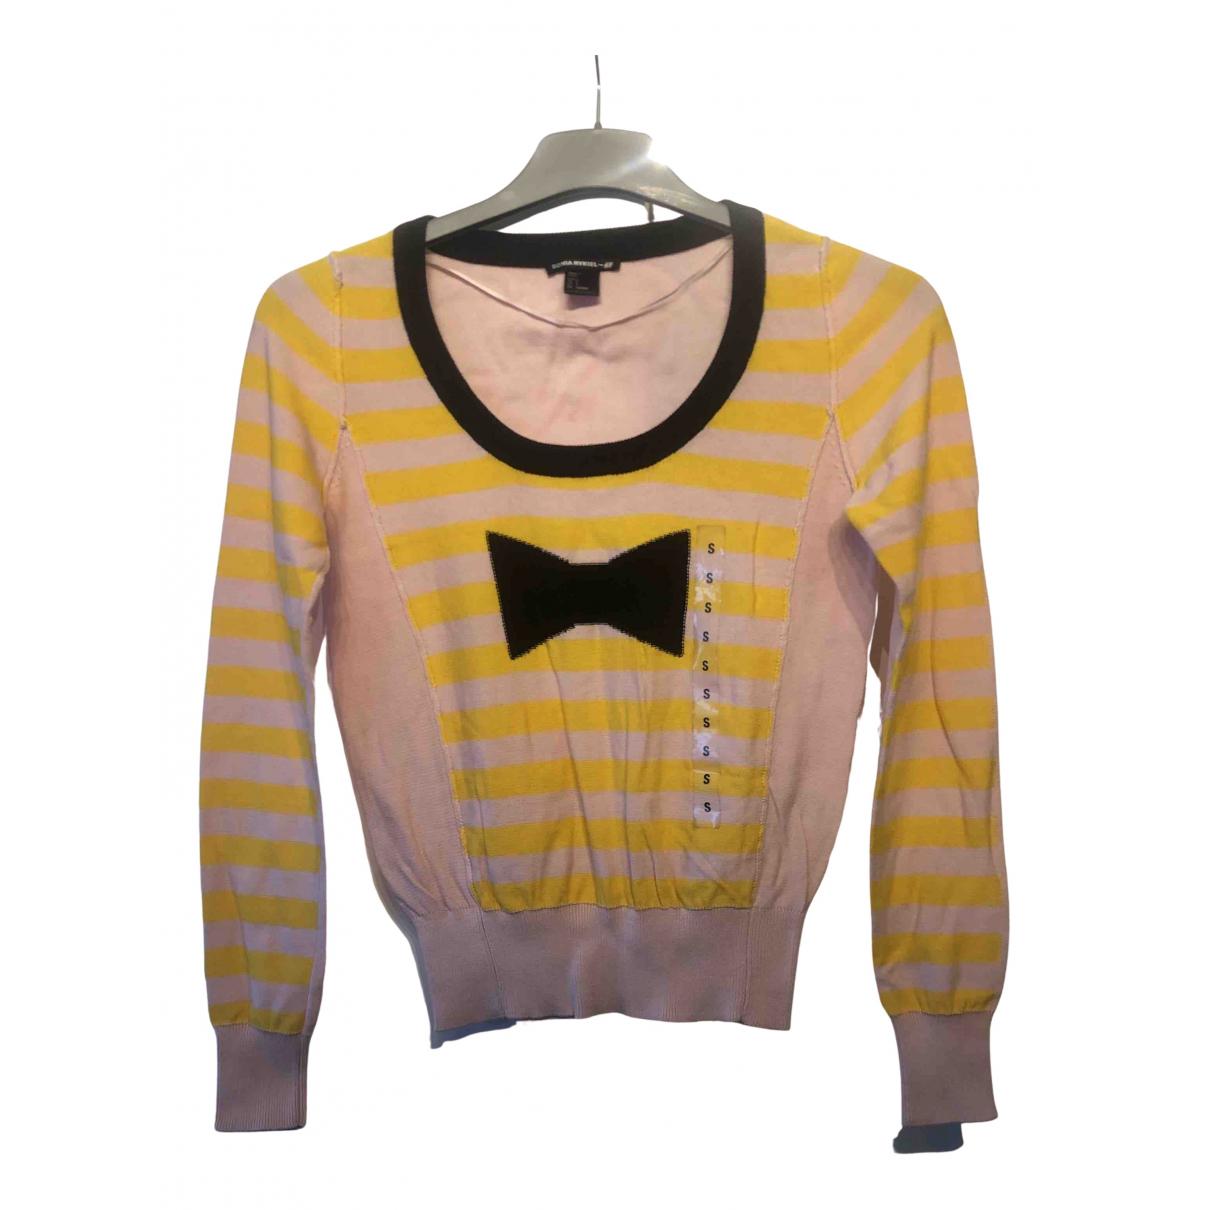 Sonia Rykiel Pour H&m N Multicolour Cotton Knitwear for Women S International